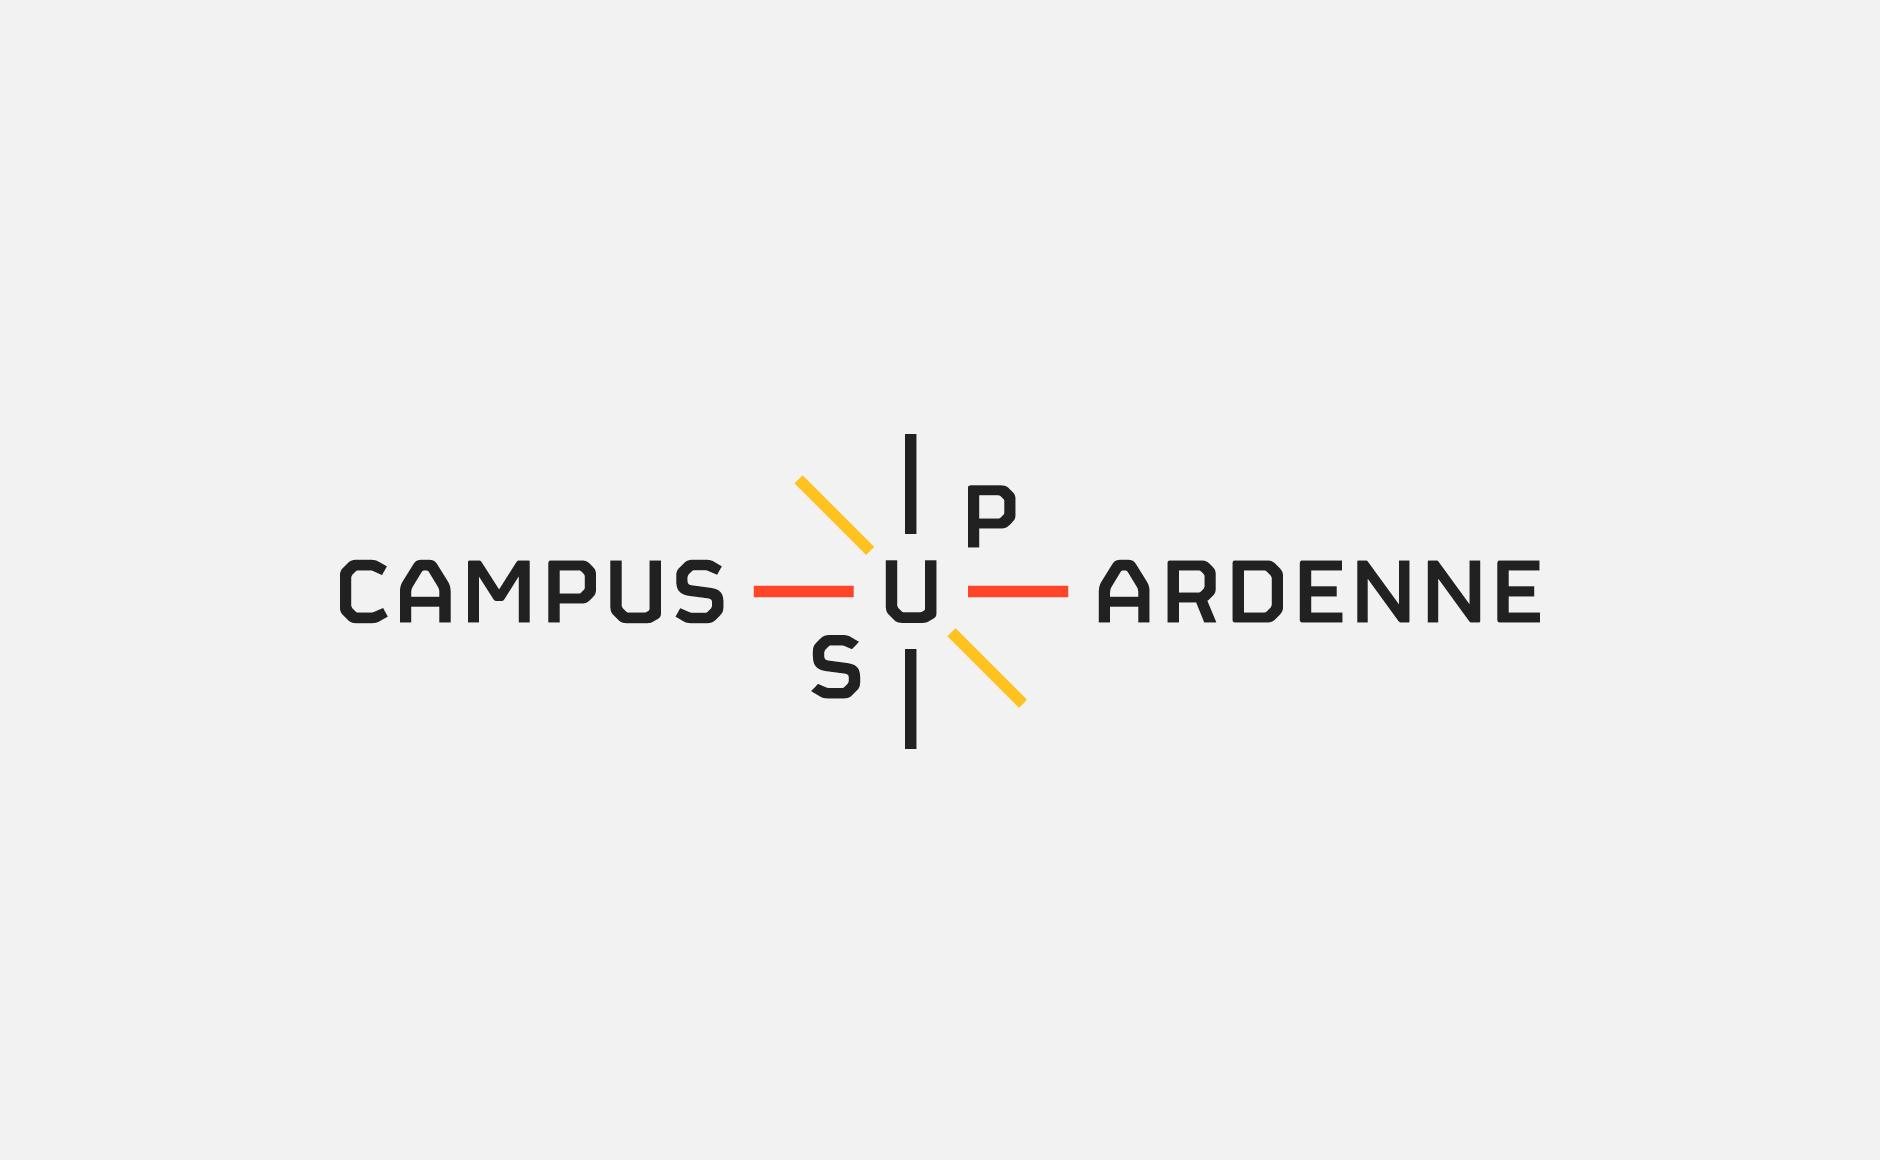 logo campus sup ardenne blanc